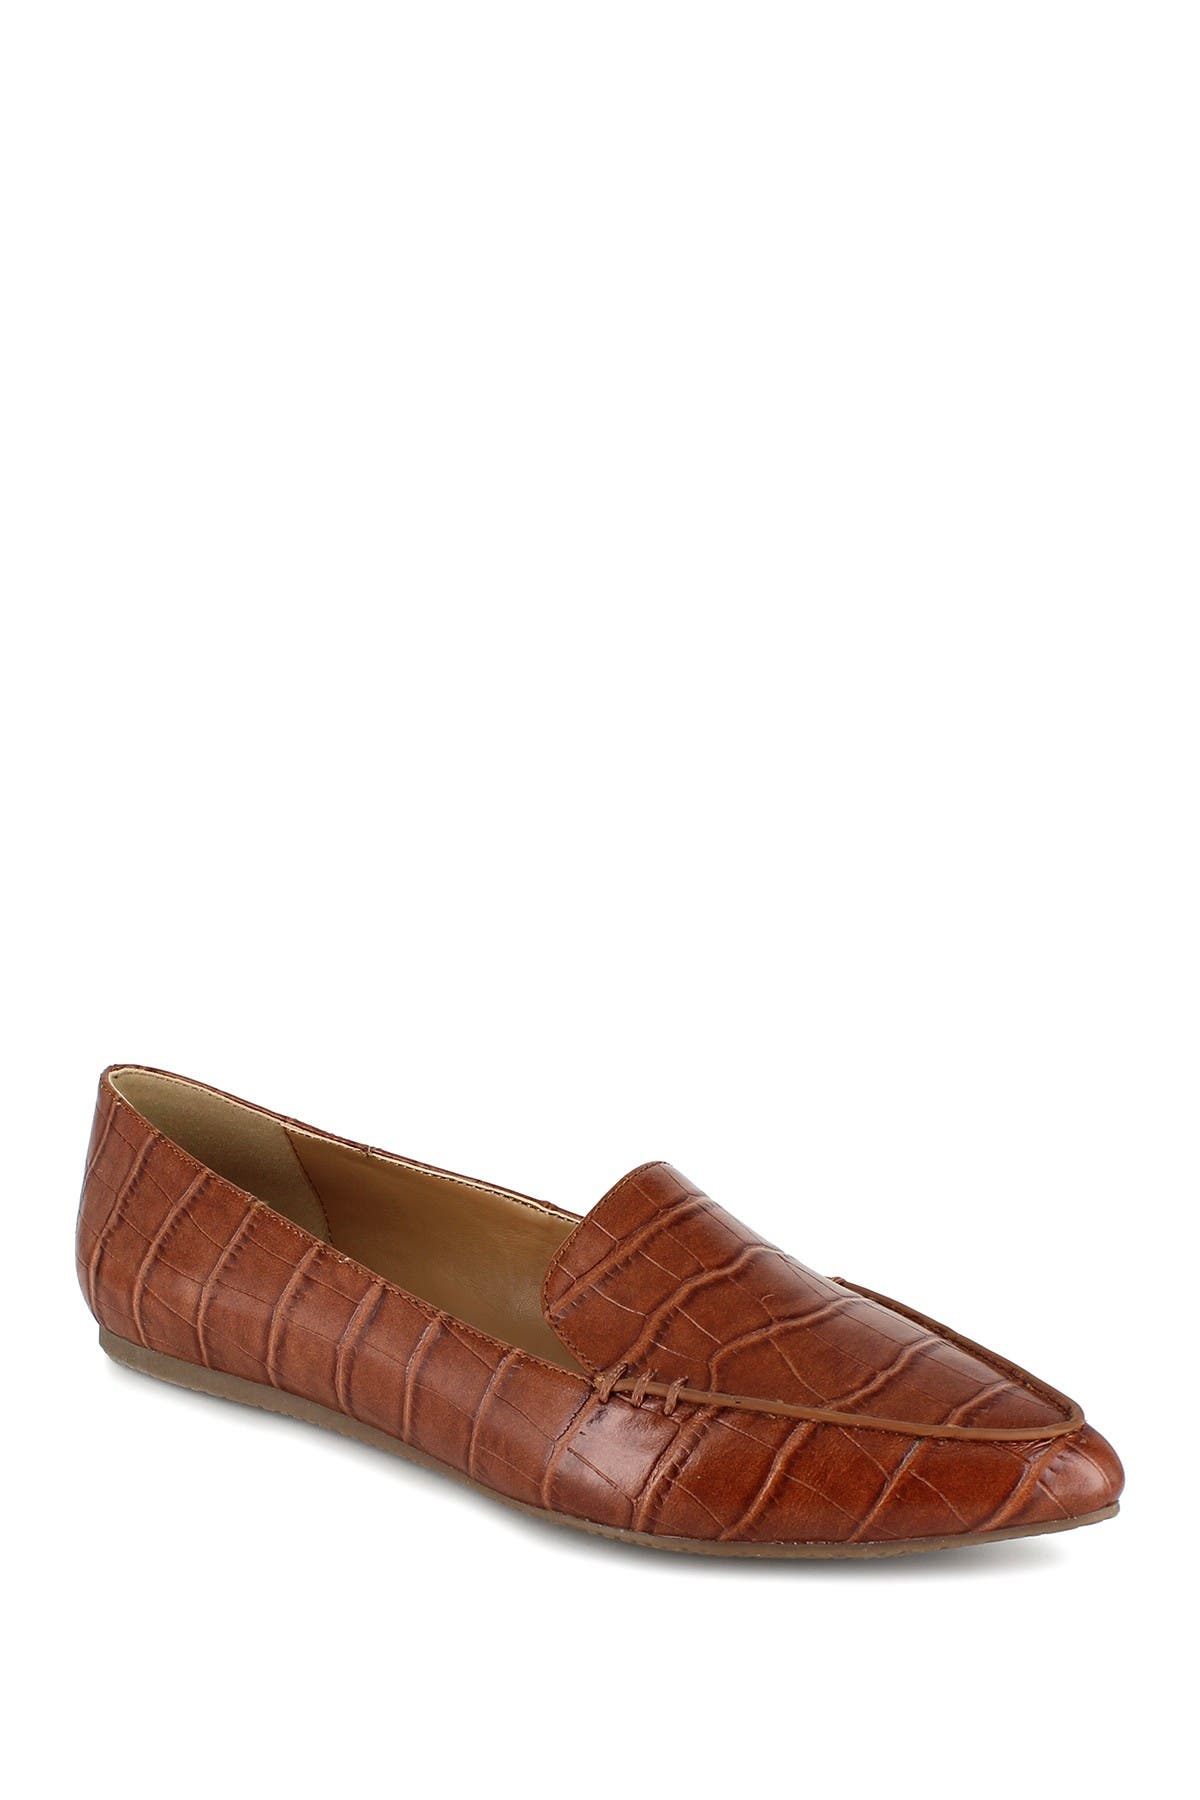 Image of Esprit Blaire Croc Embossed Flat